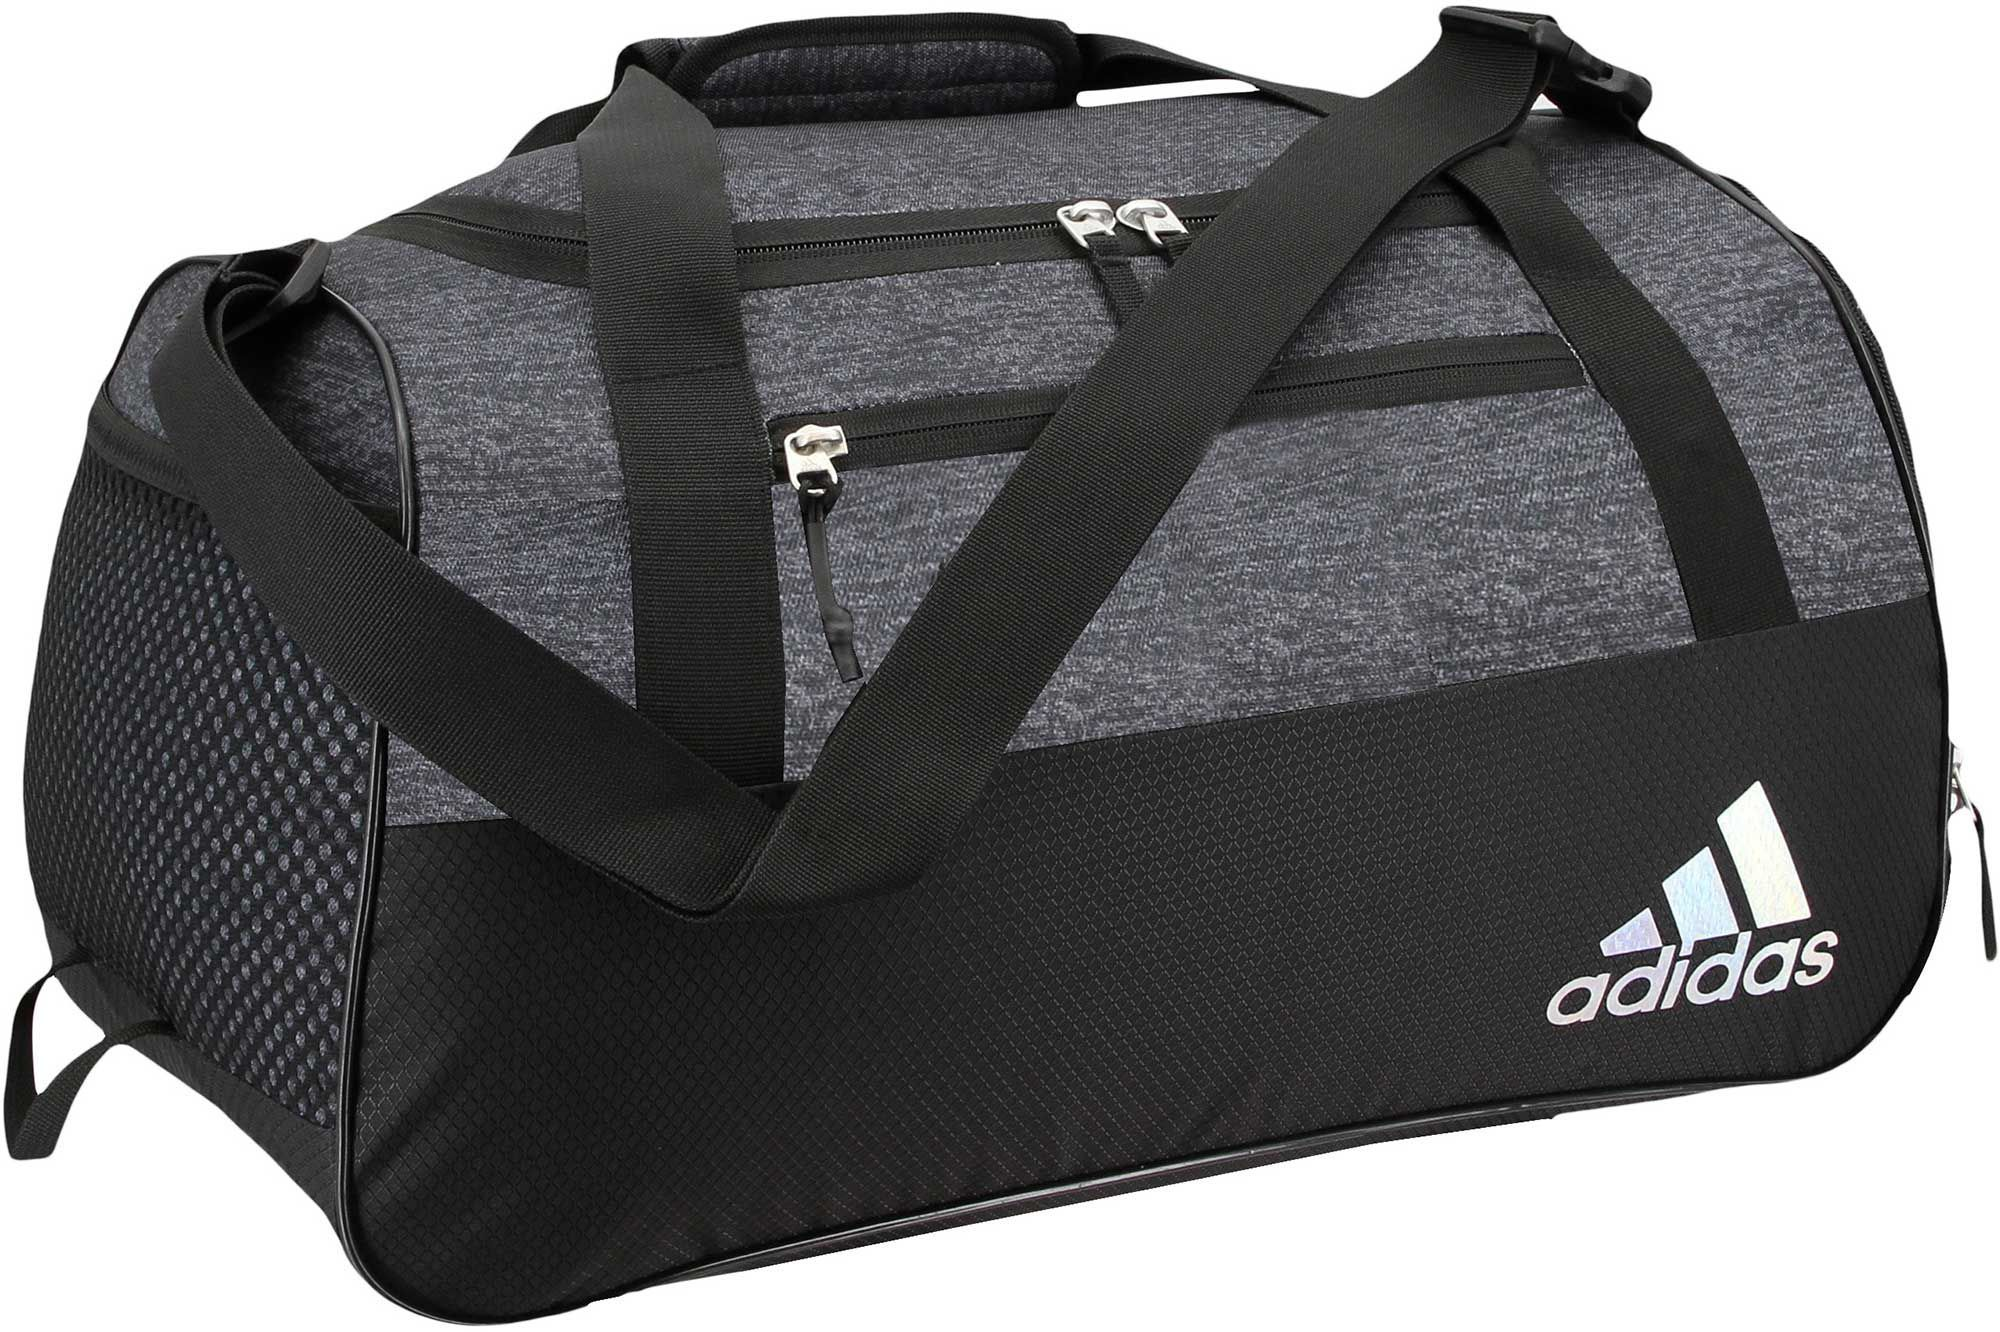 Adidas Women S Squad Iii Duffle Bag In 2020 Adidas Duffle Bag Minimalist Bag Duffel Bag